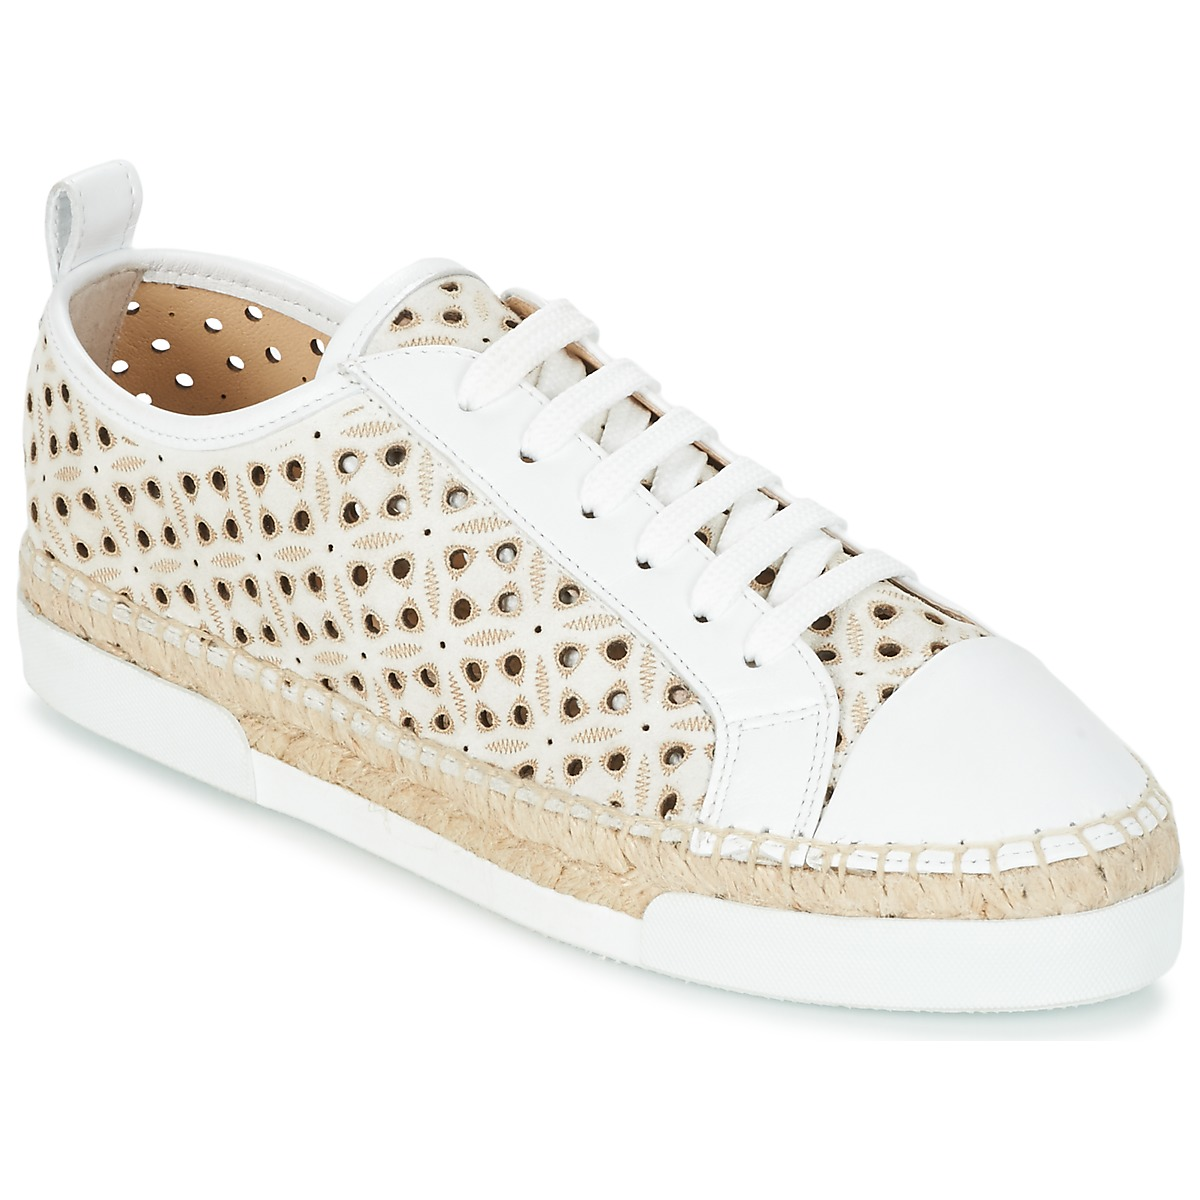 Sonia Rykiel 622348 Weiss - Kostenloser Versand bei Spartoode ! - Schuhe Sneaker Low Damen 144,50 €